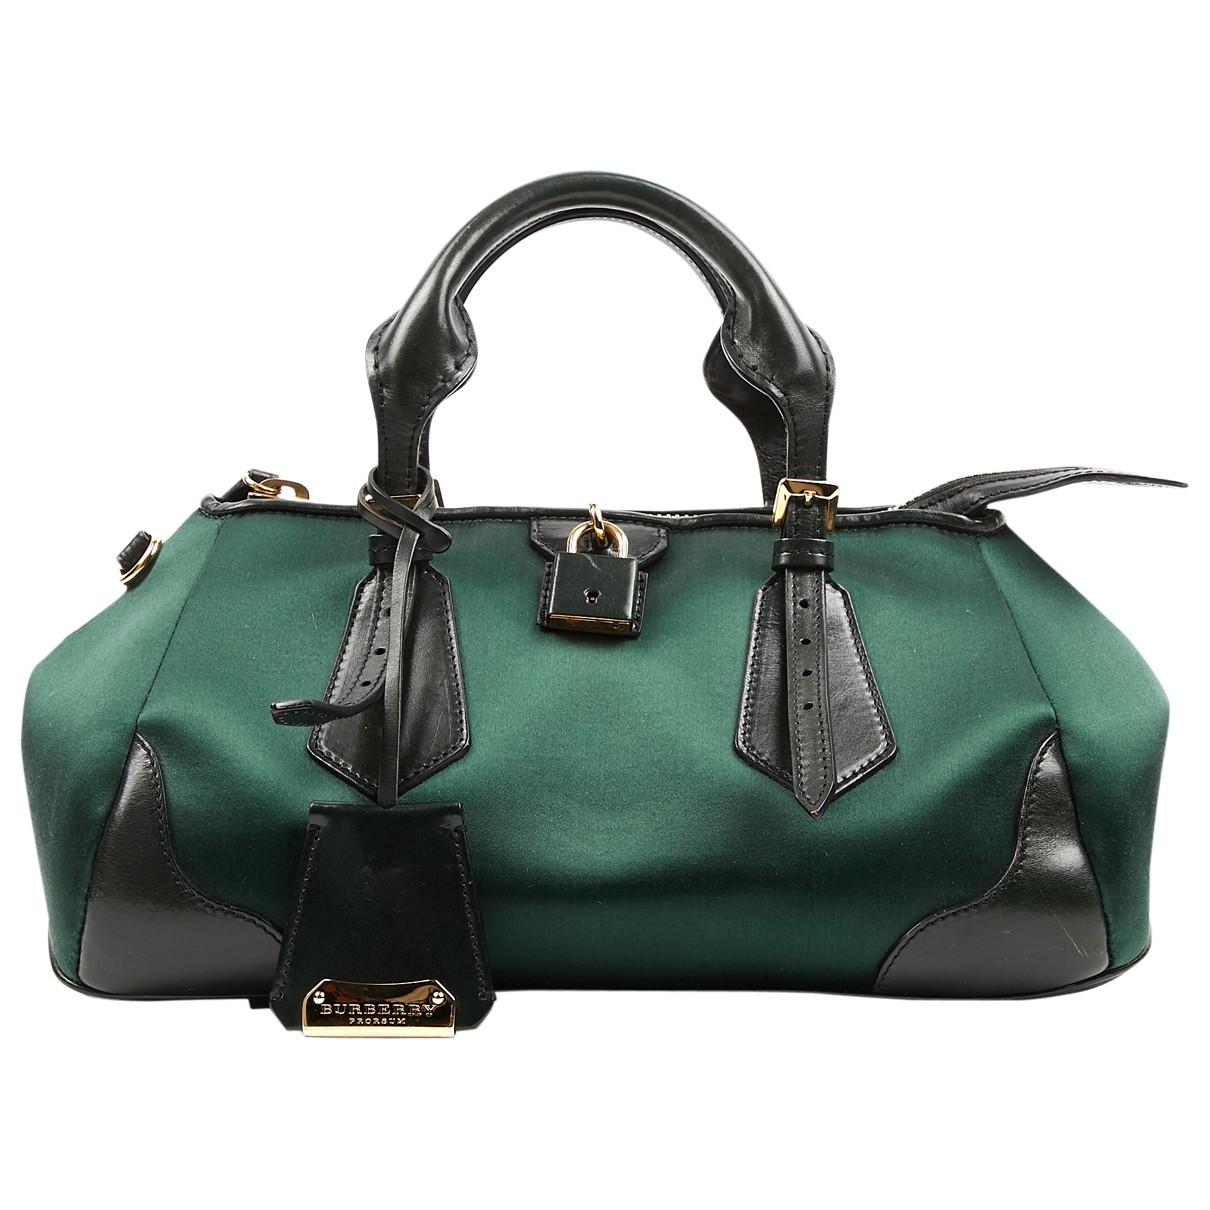 Burberry \N Green Cloth handbag for Women \N